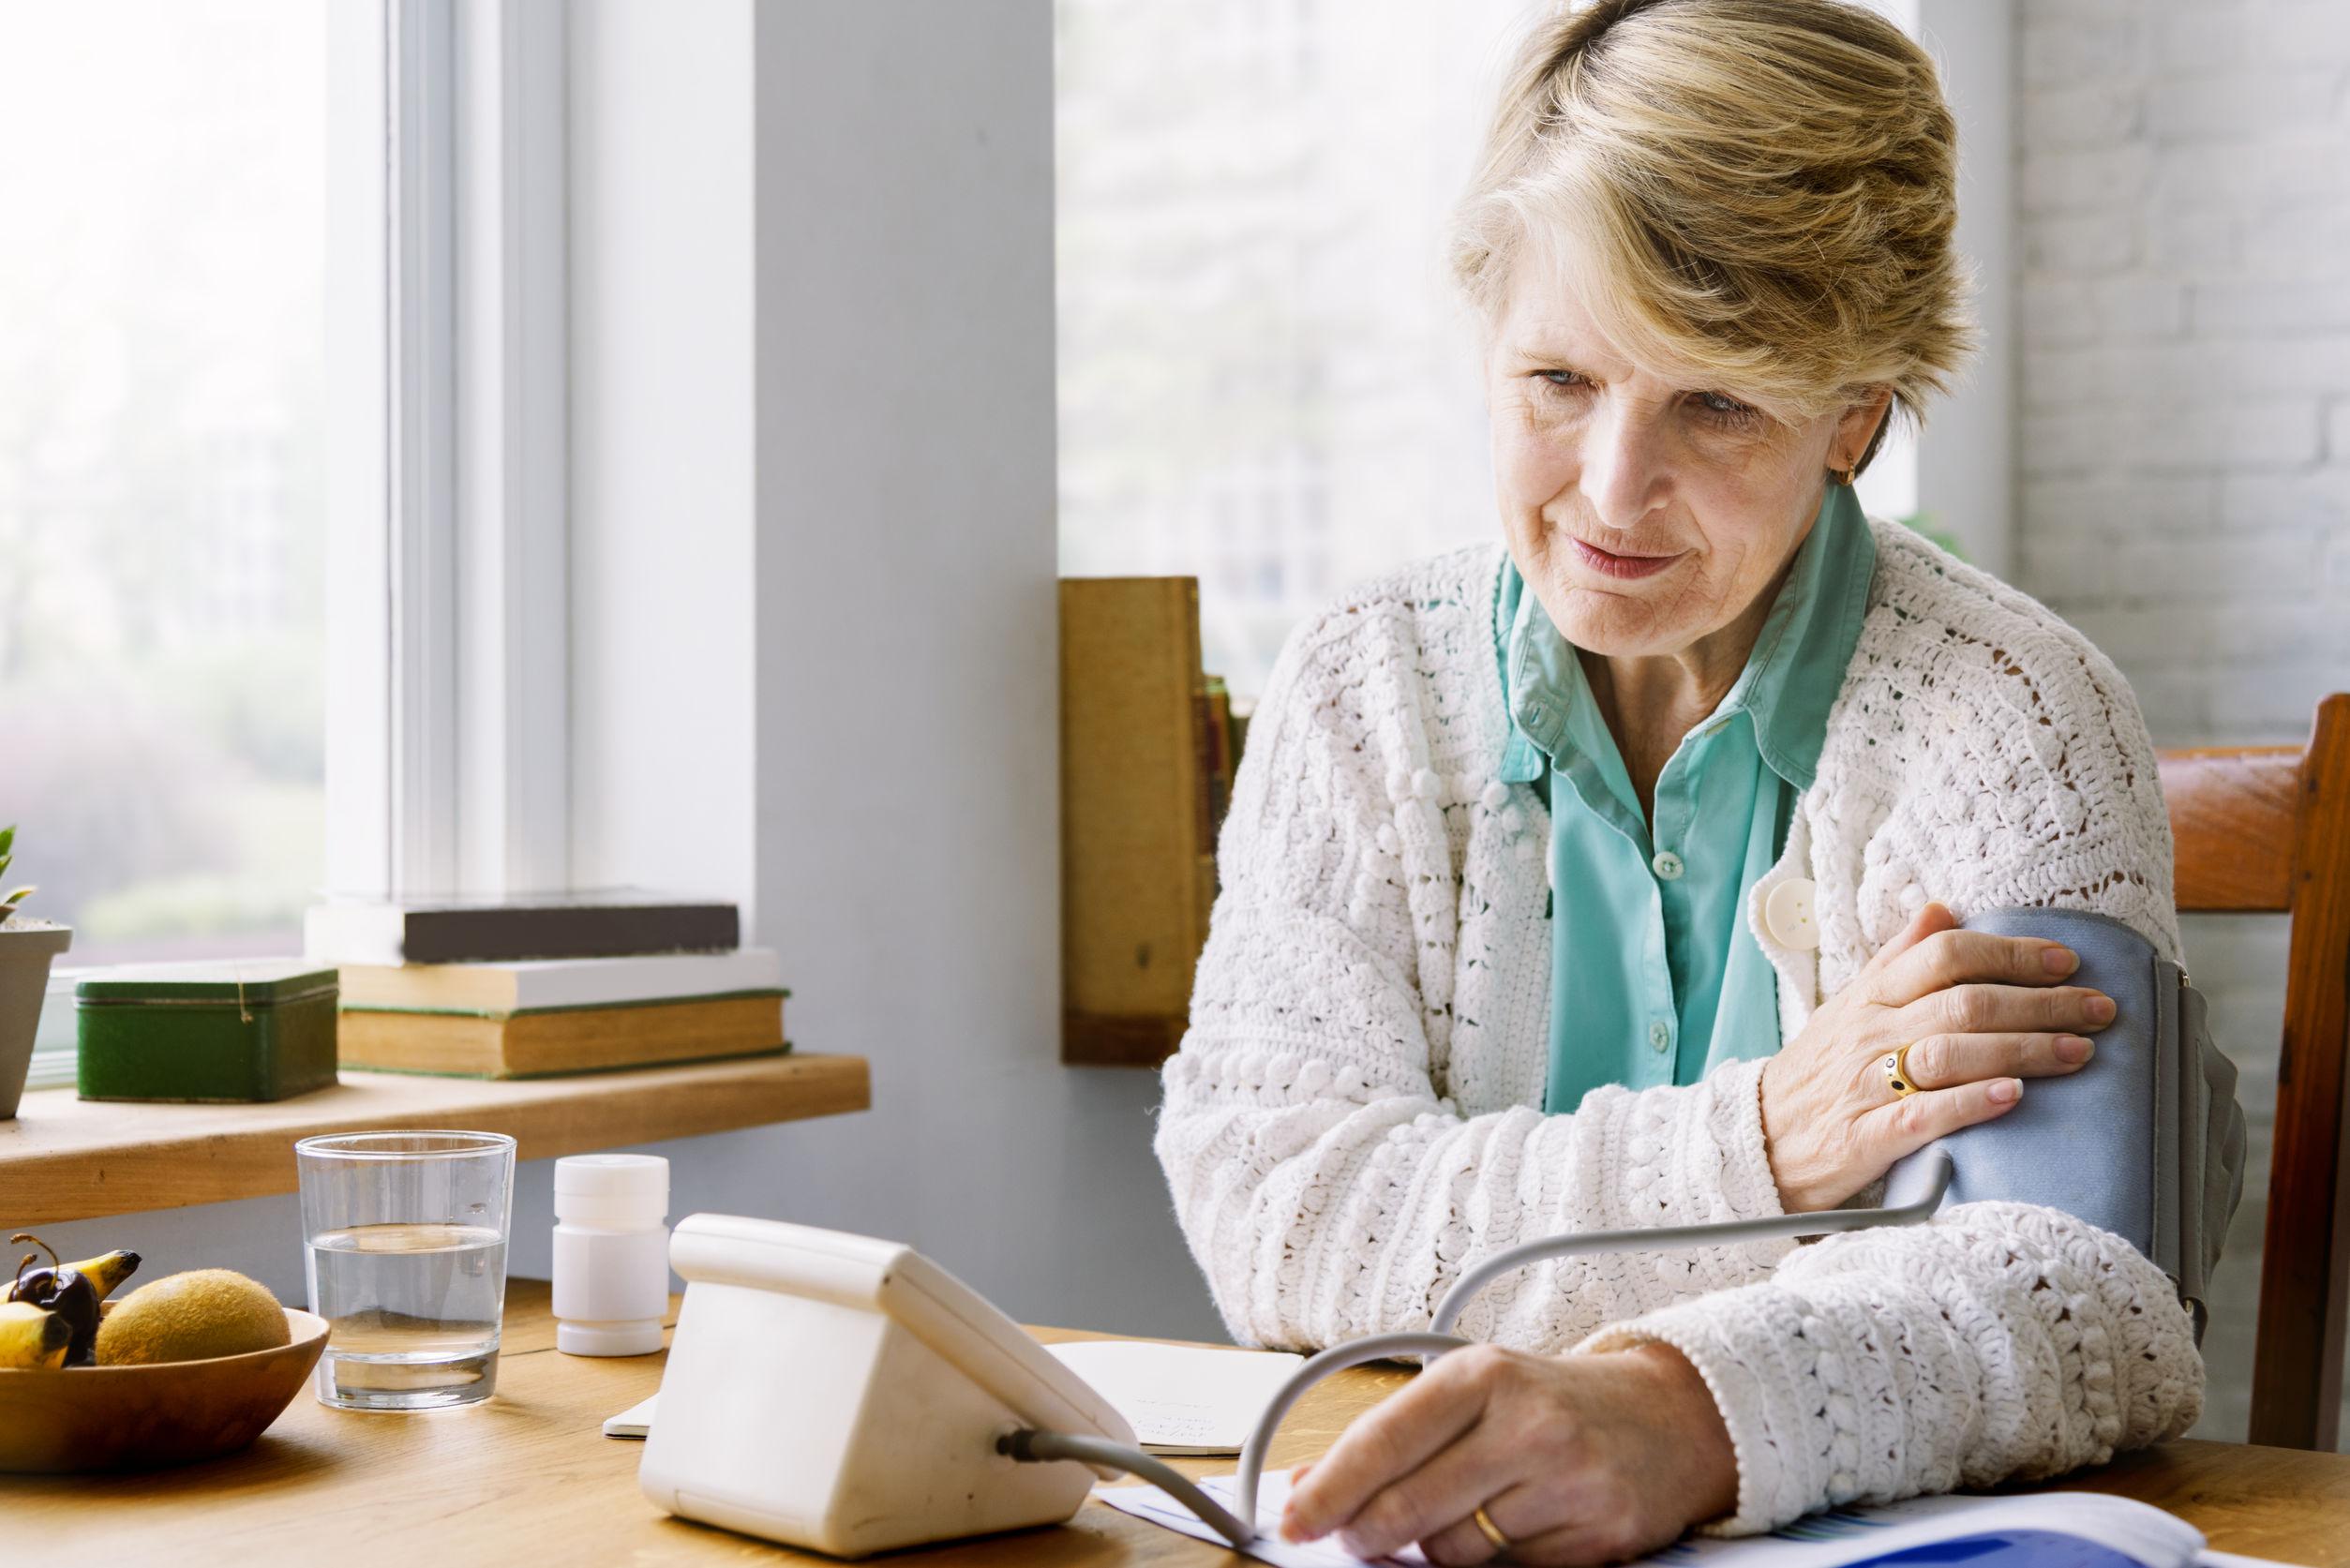 reggeli magas vérnyomás hasznos mit